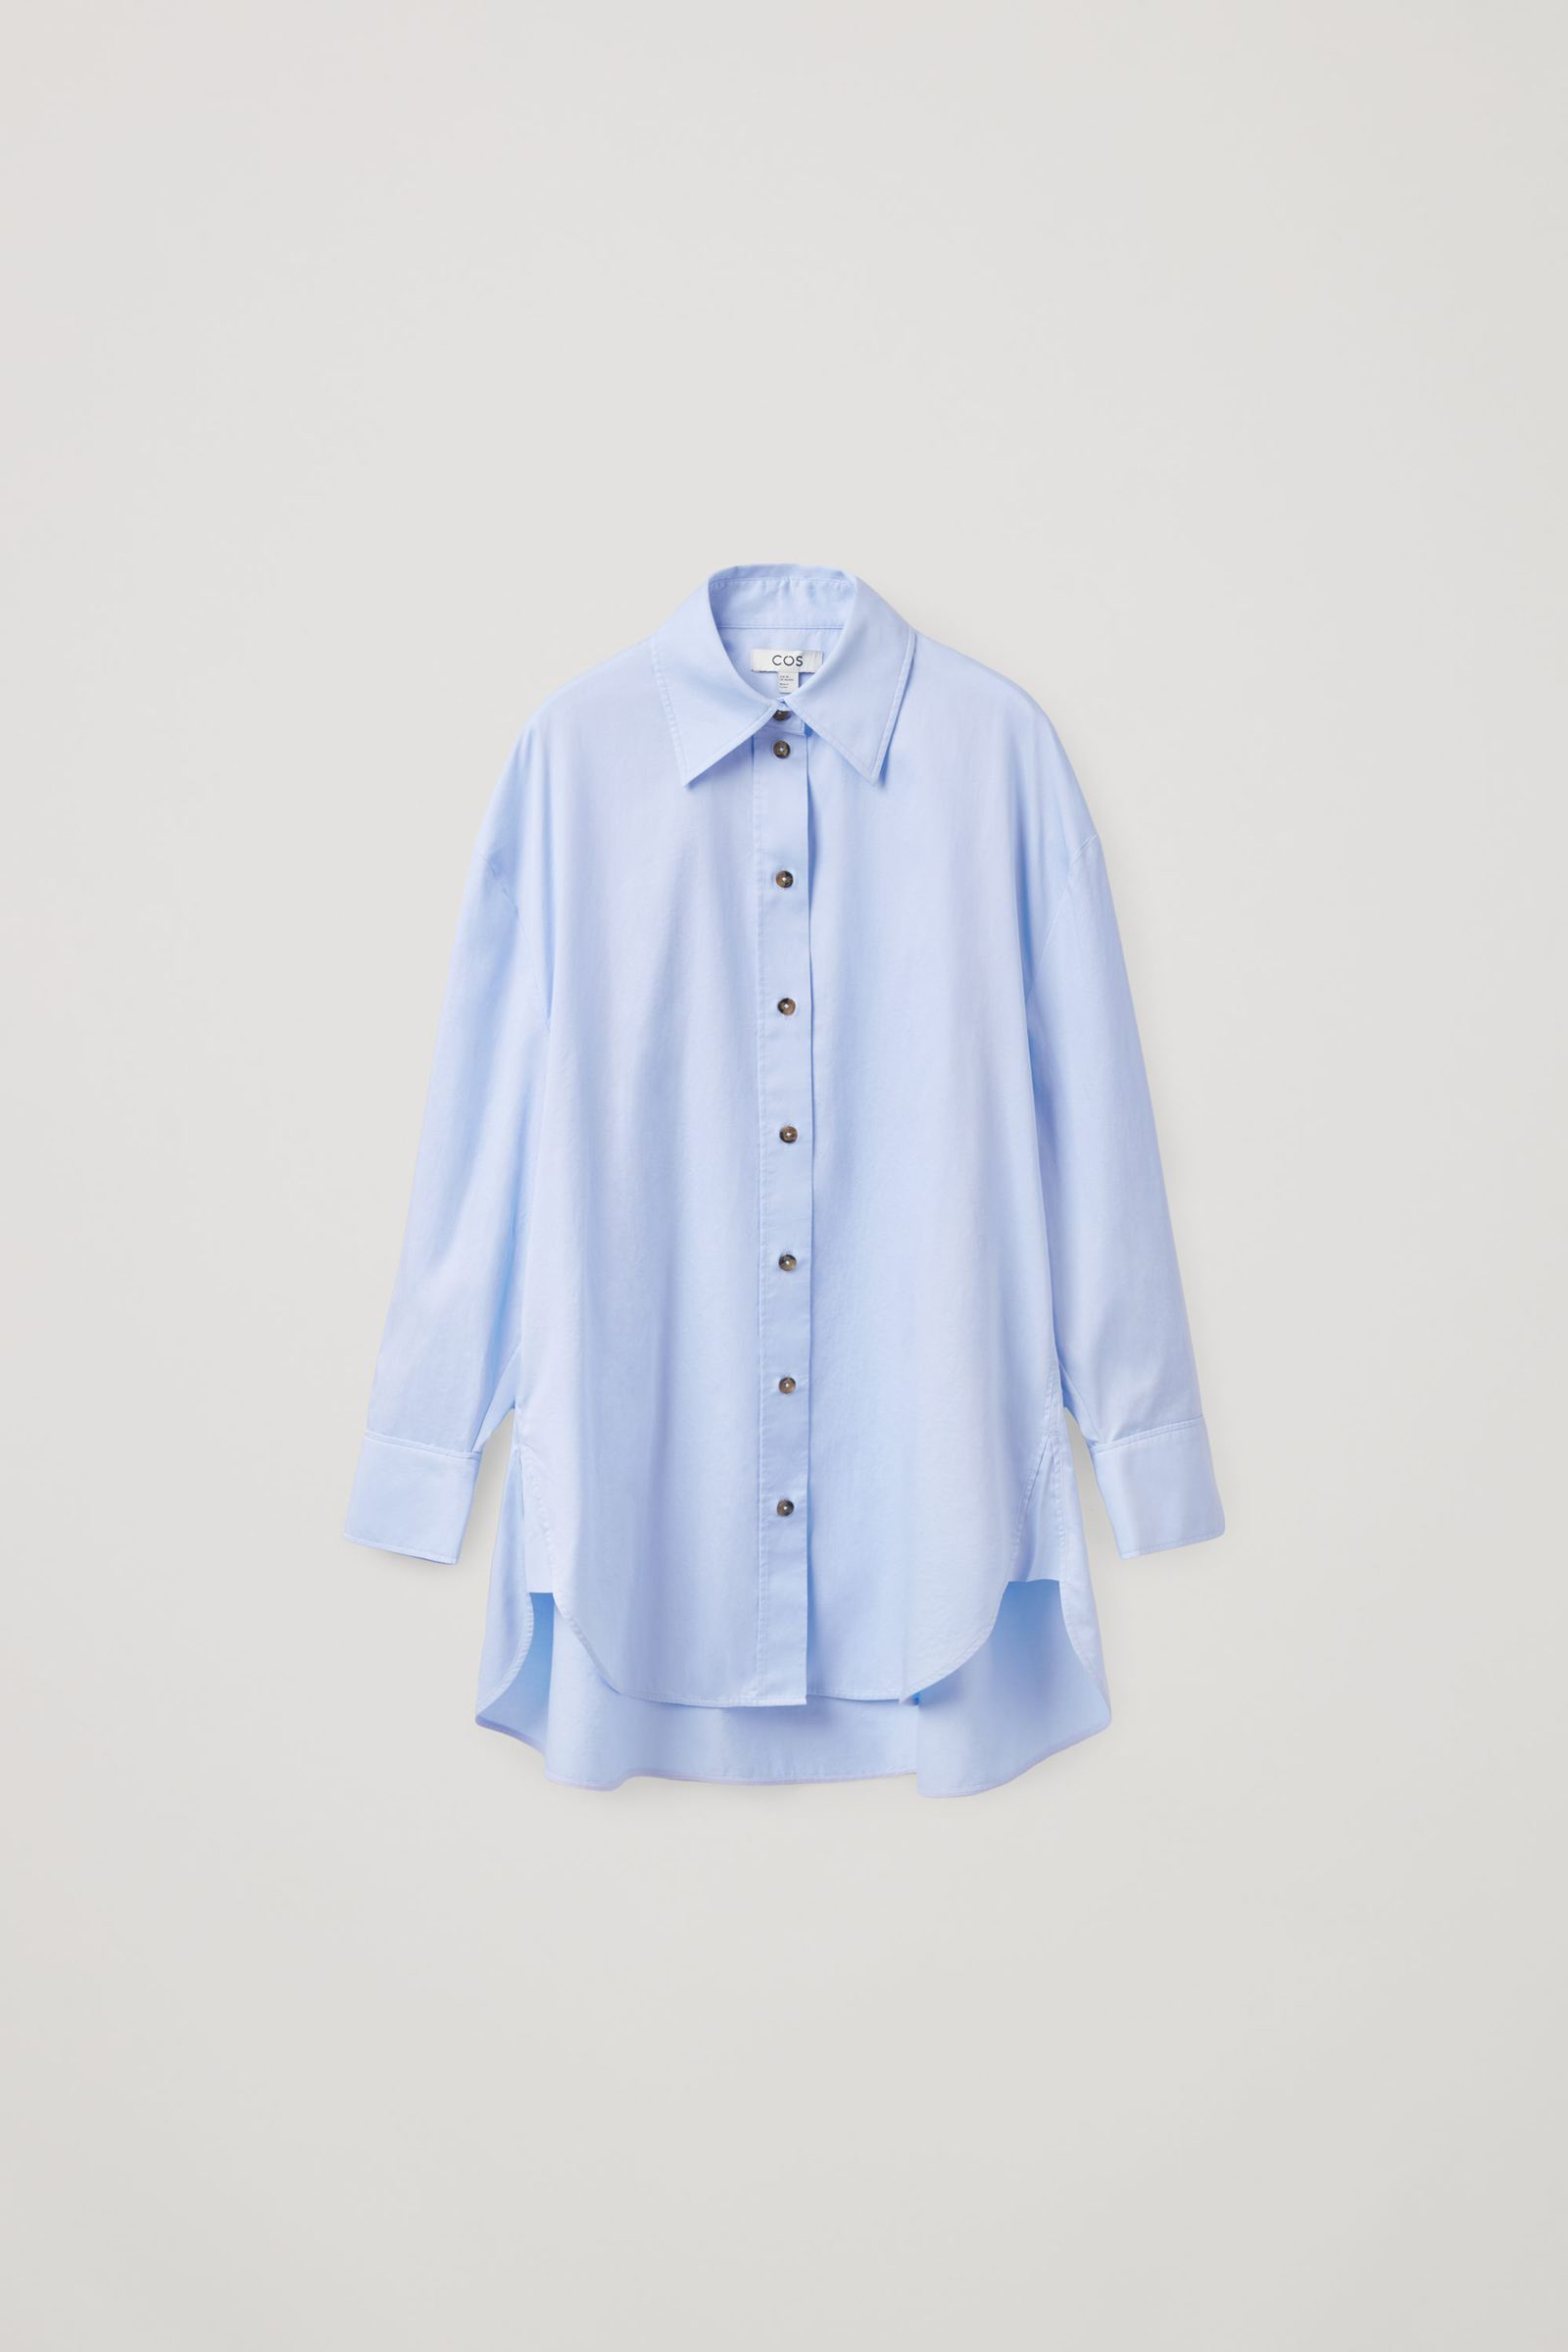 COS 오버사이즈 셔츠 의 라이트 블루컬러 Product입니다.